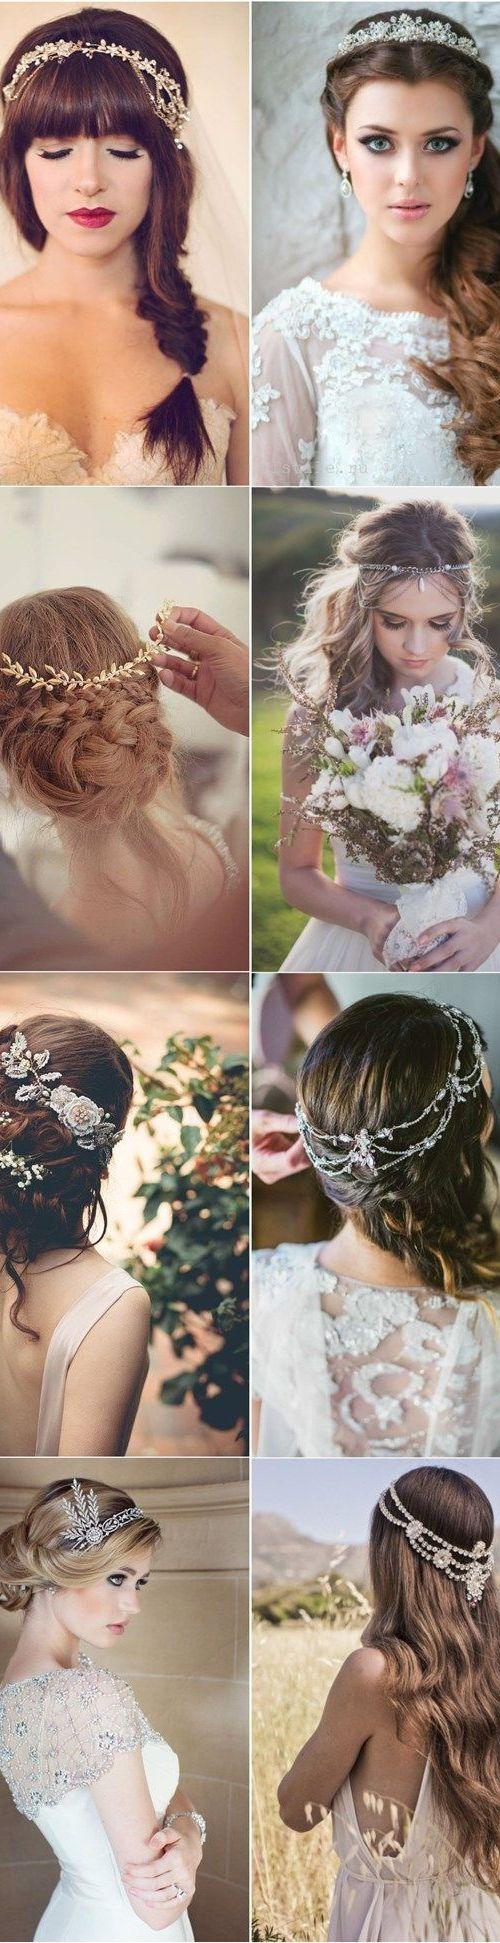 Eight Romantic Bridal Hairstyles